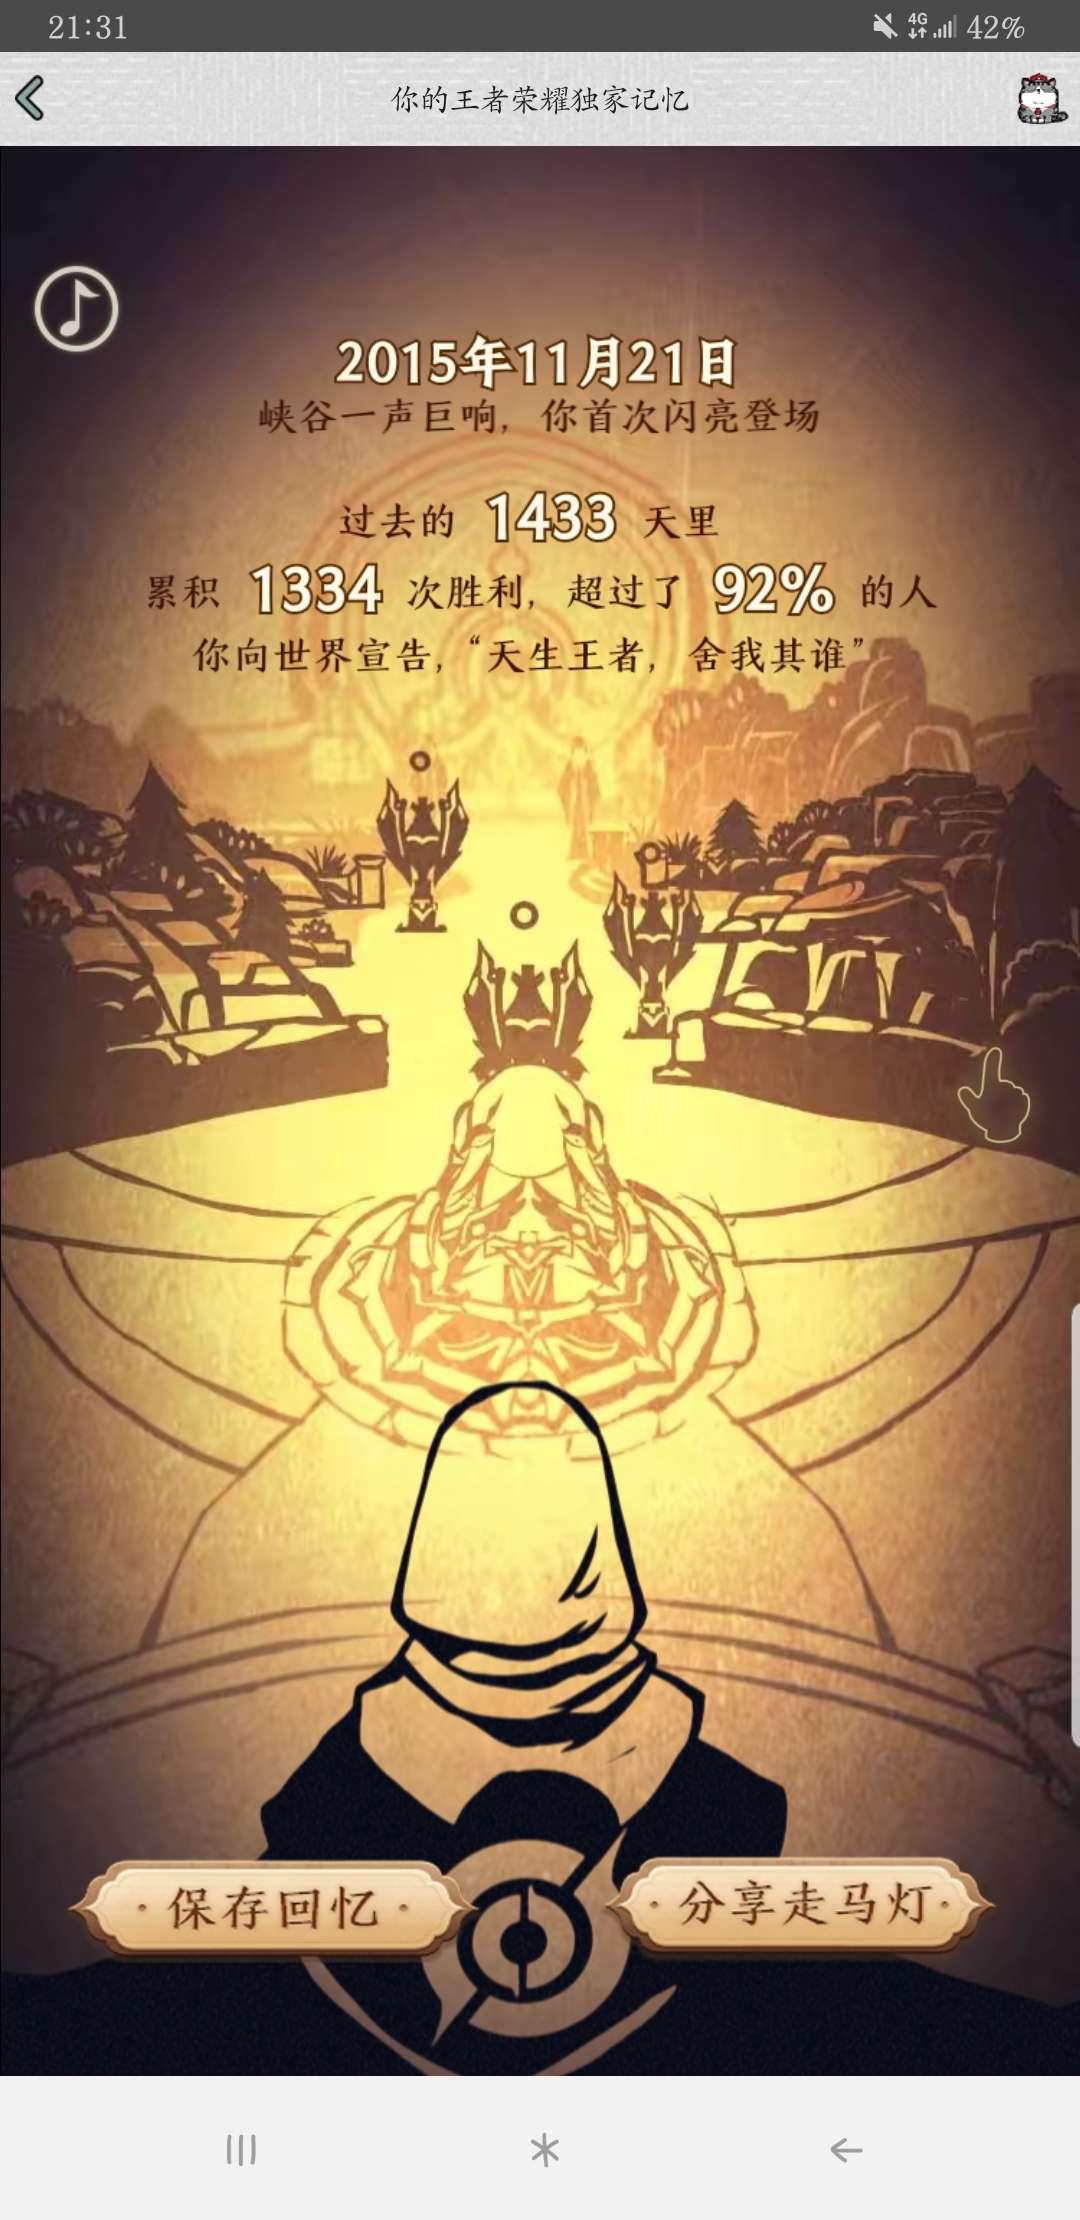 【王者女神】-www.im86.com